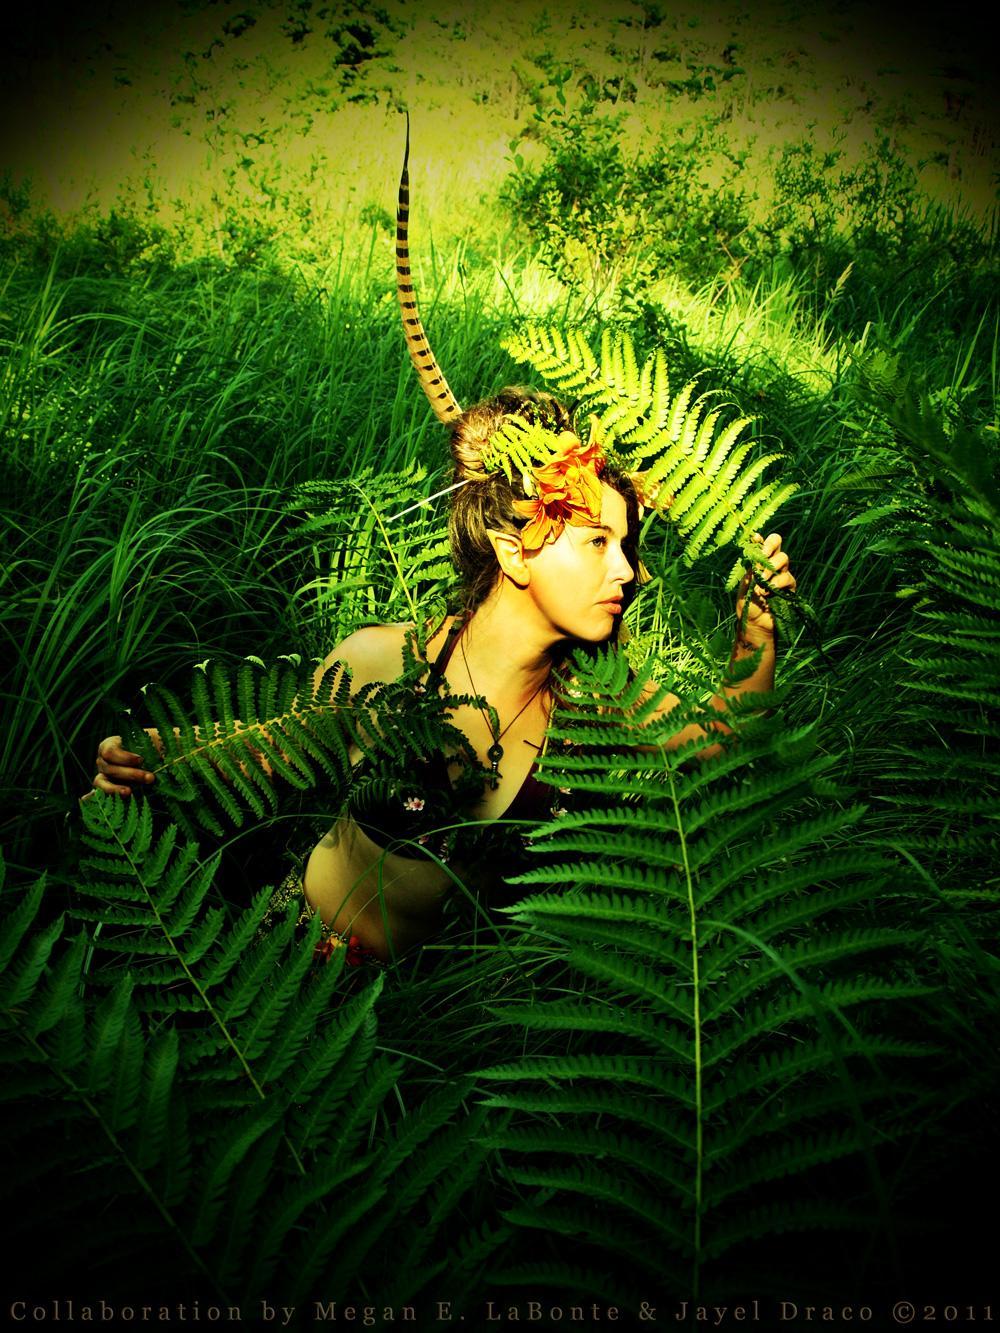 Fern Princess - Costume, Photography, and Photomanipulation by Jayel Draco